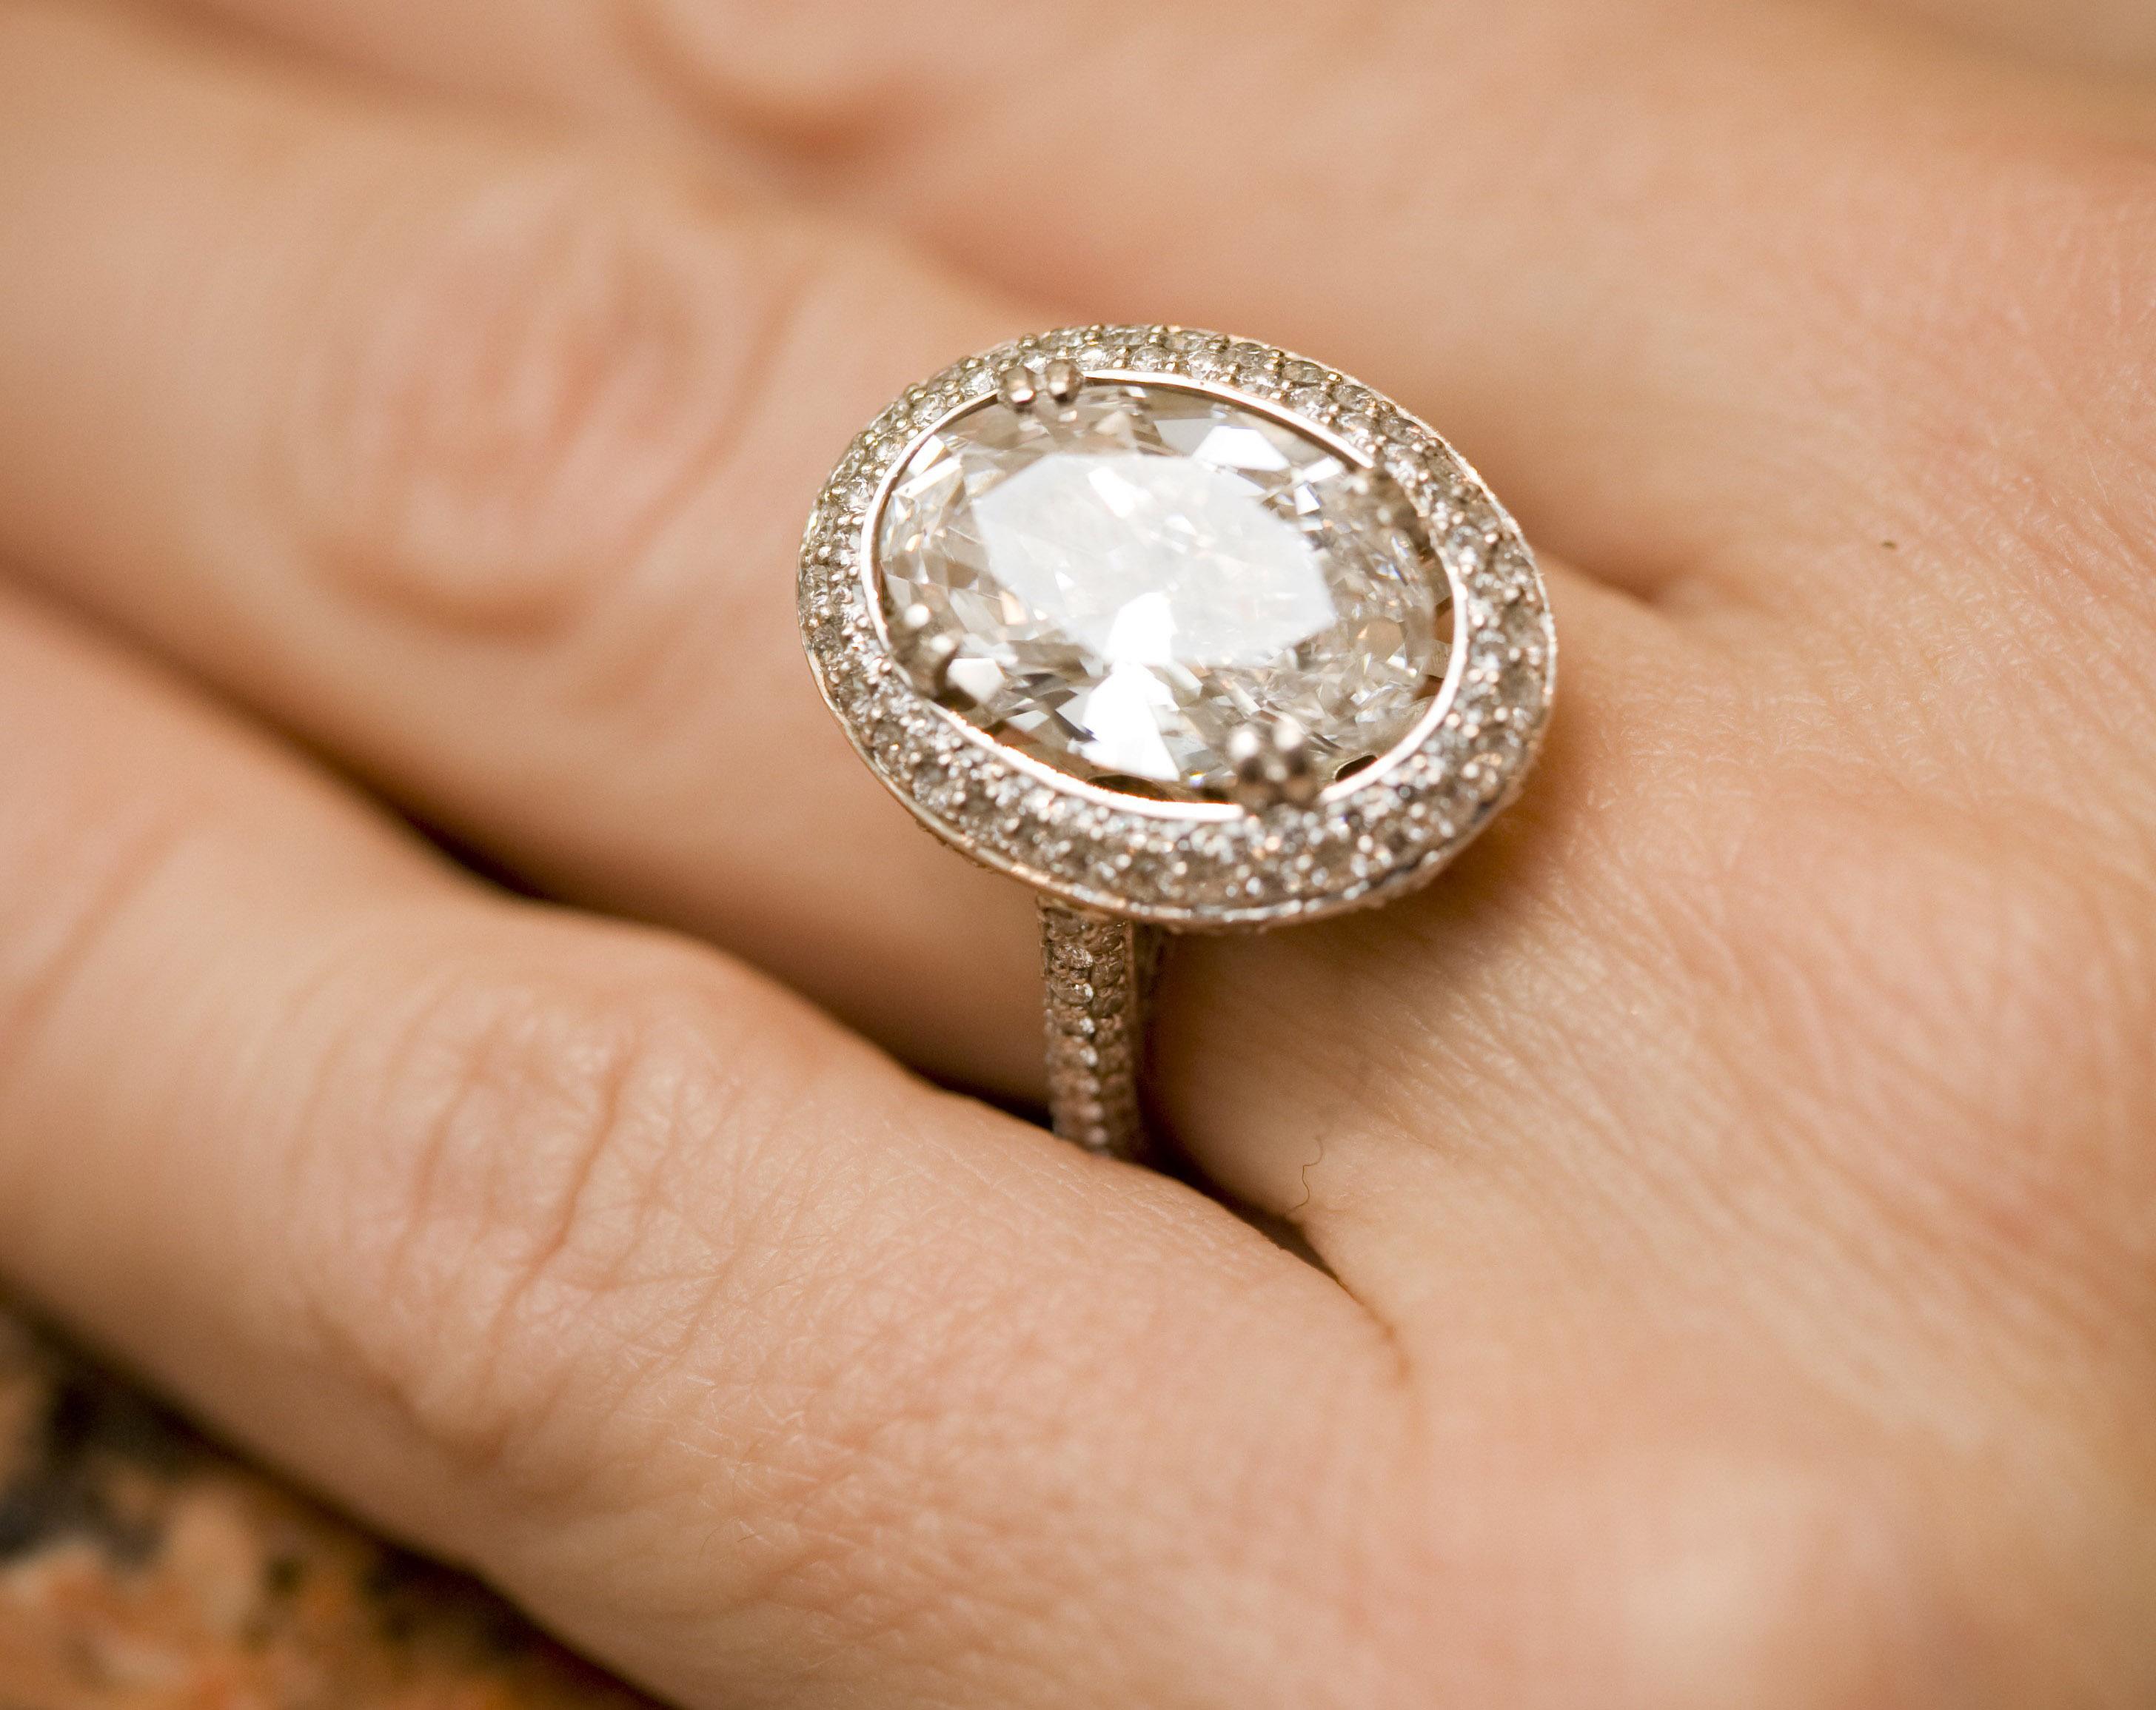 jesse plemons engaged to kirsten dunst engagement ring inspiration oval diamond